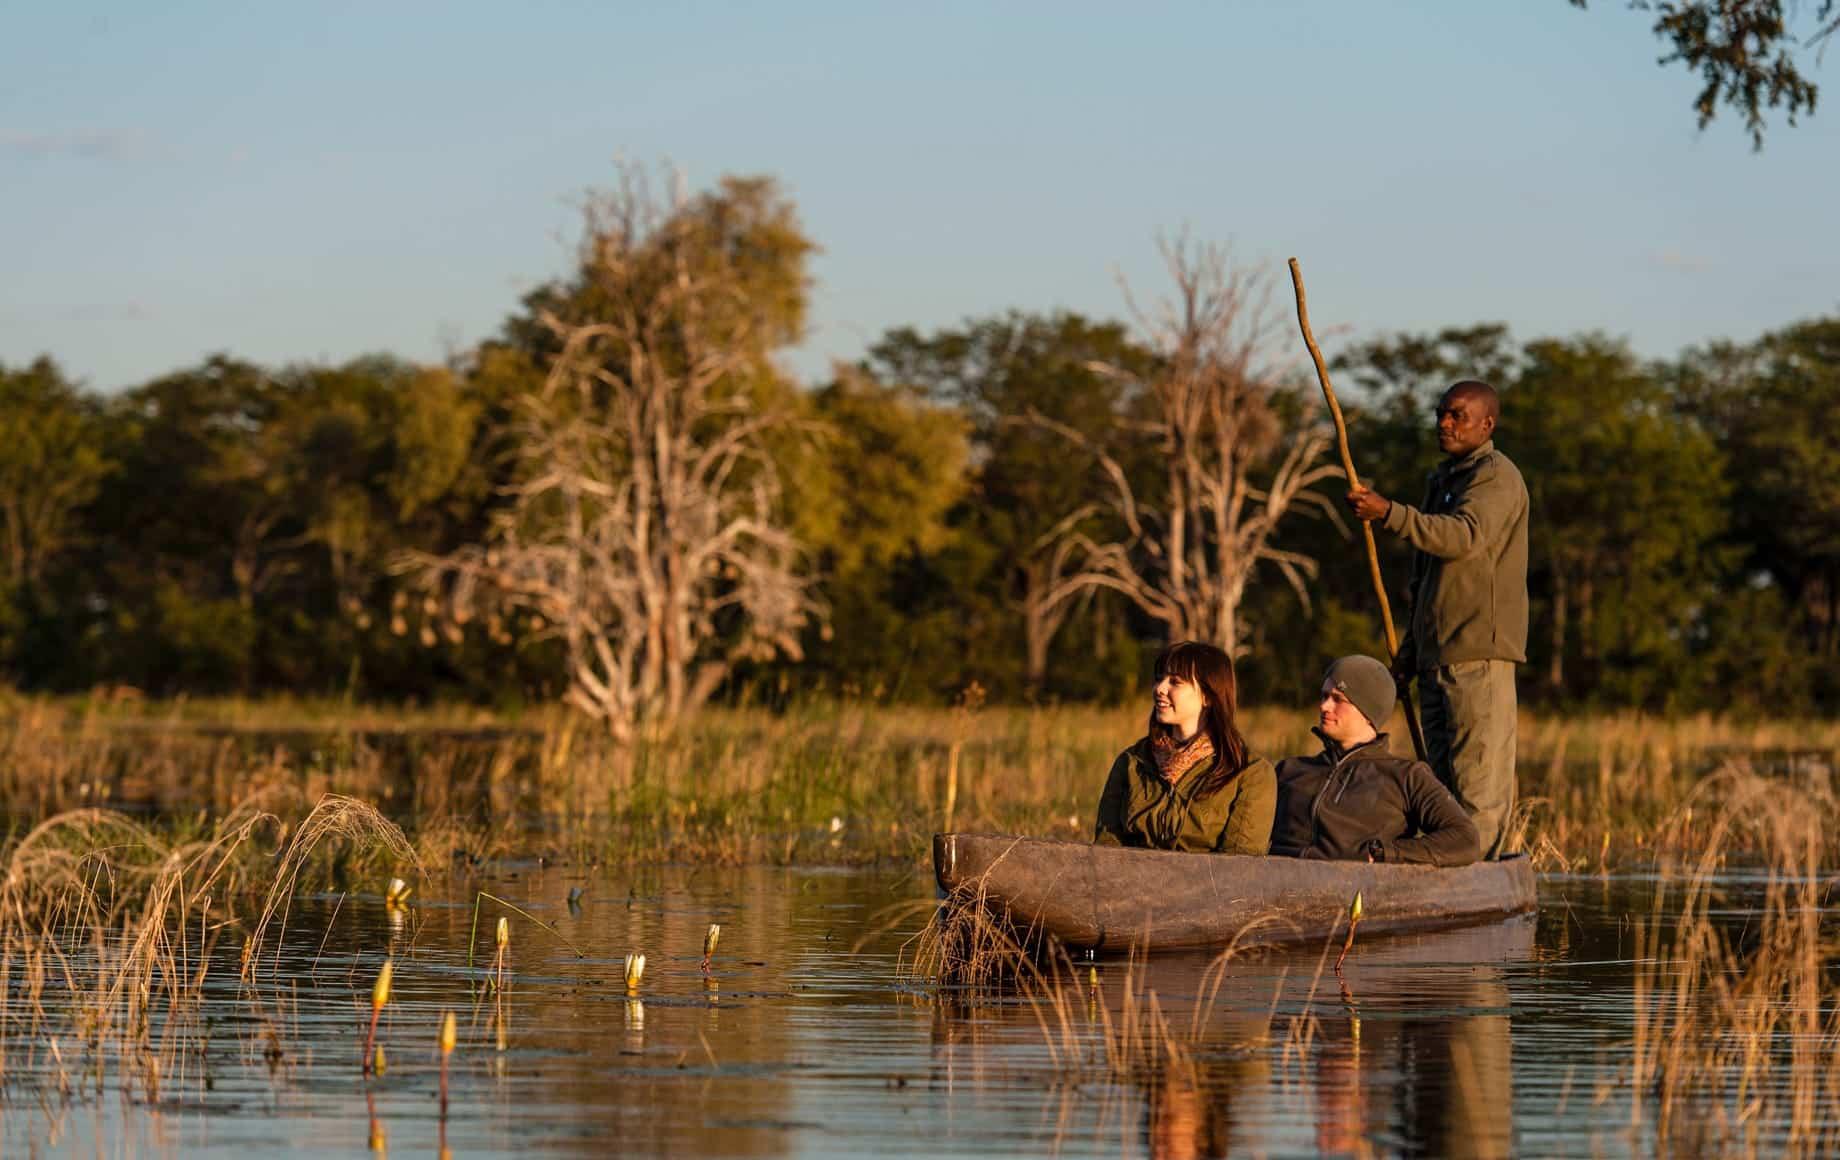 Boat ride at Sable Alley - Okavango Delta, Botswana